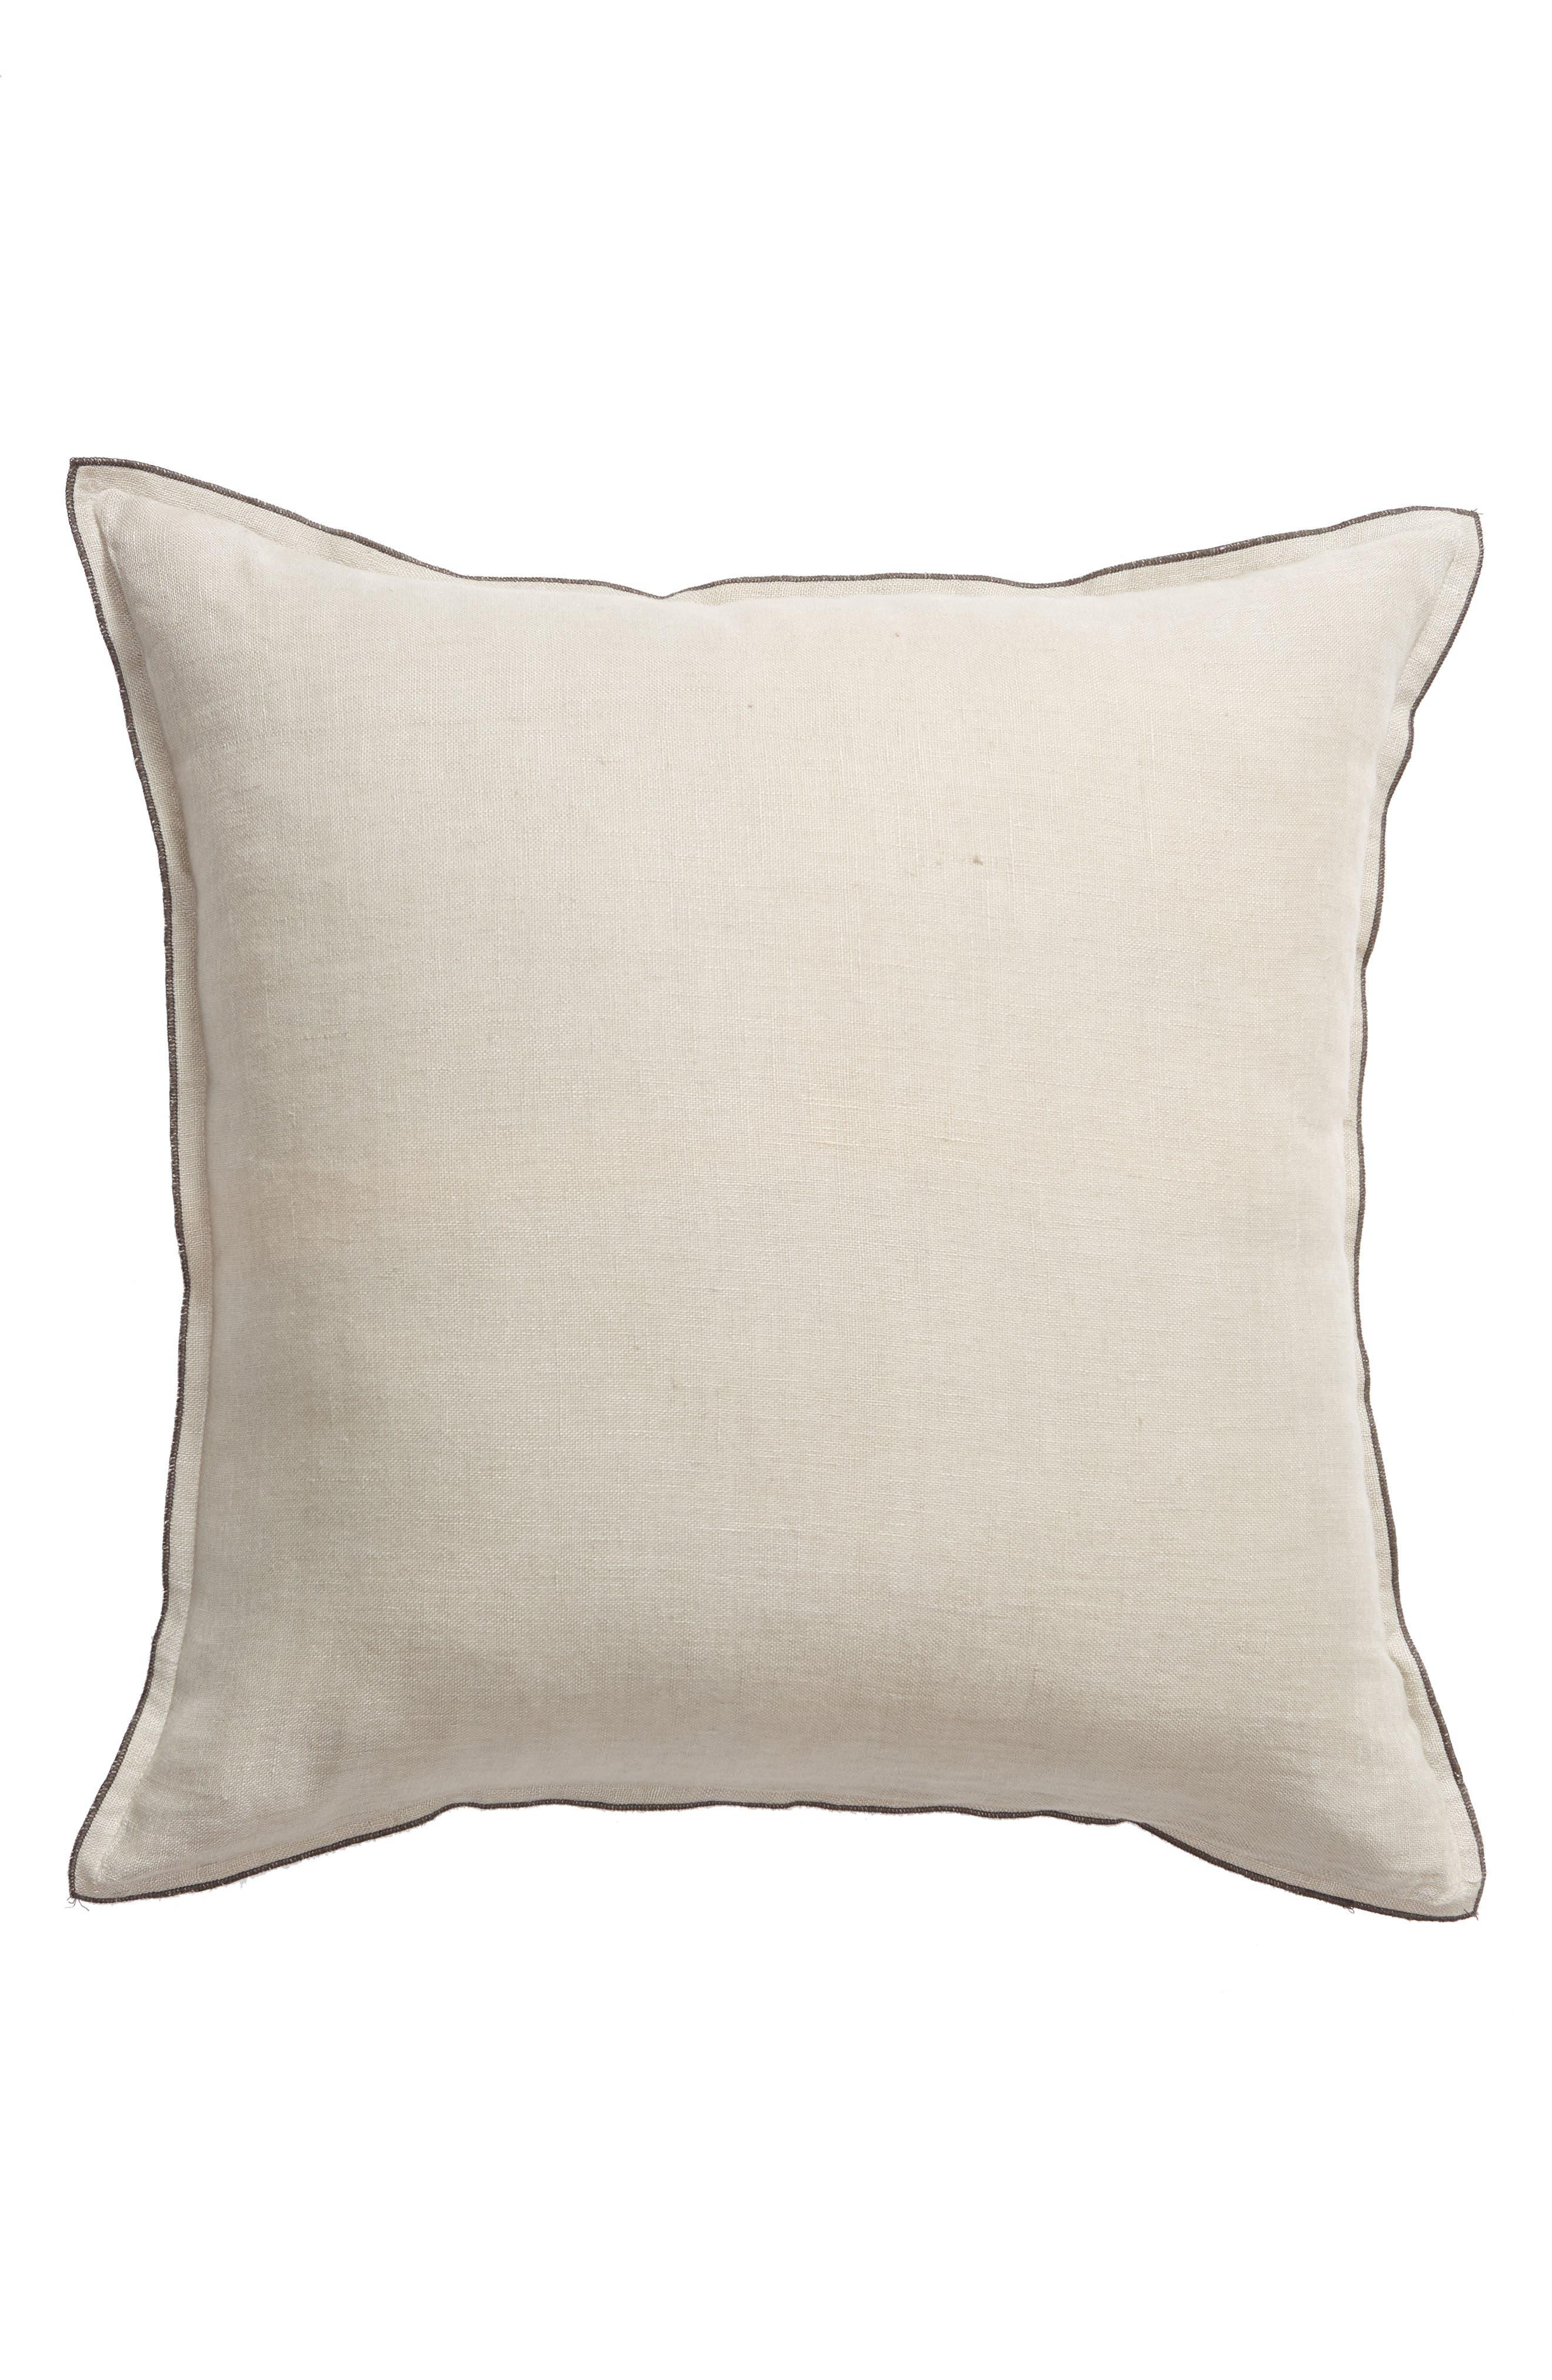 TREASURE & BOND Linen Accent Pillow, Main, color, GREY OWL